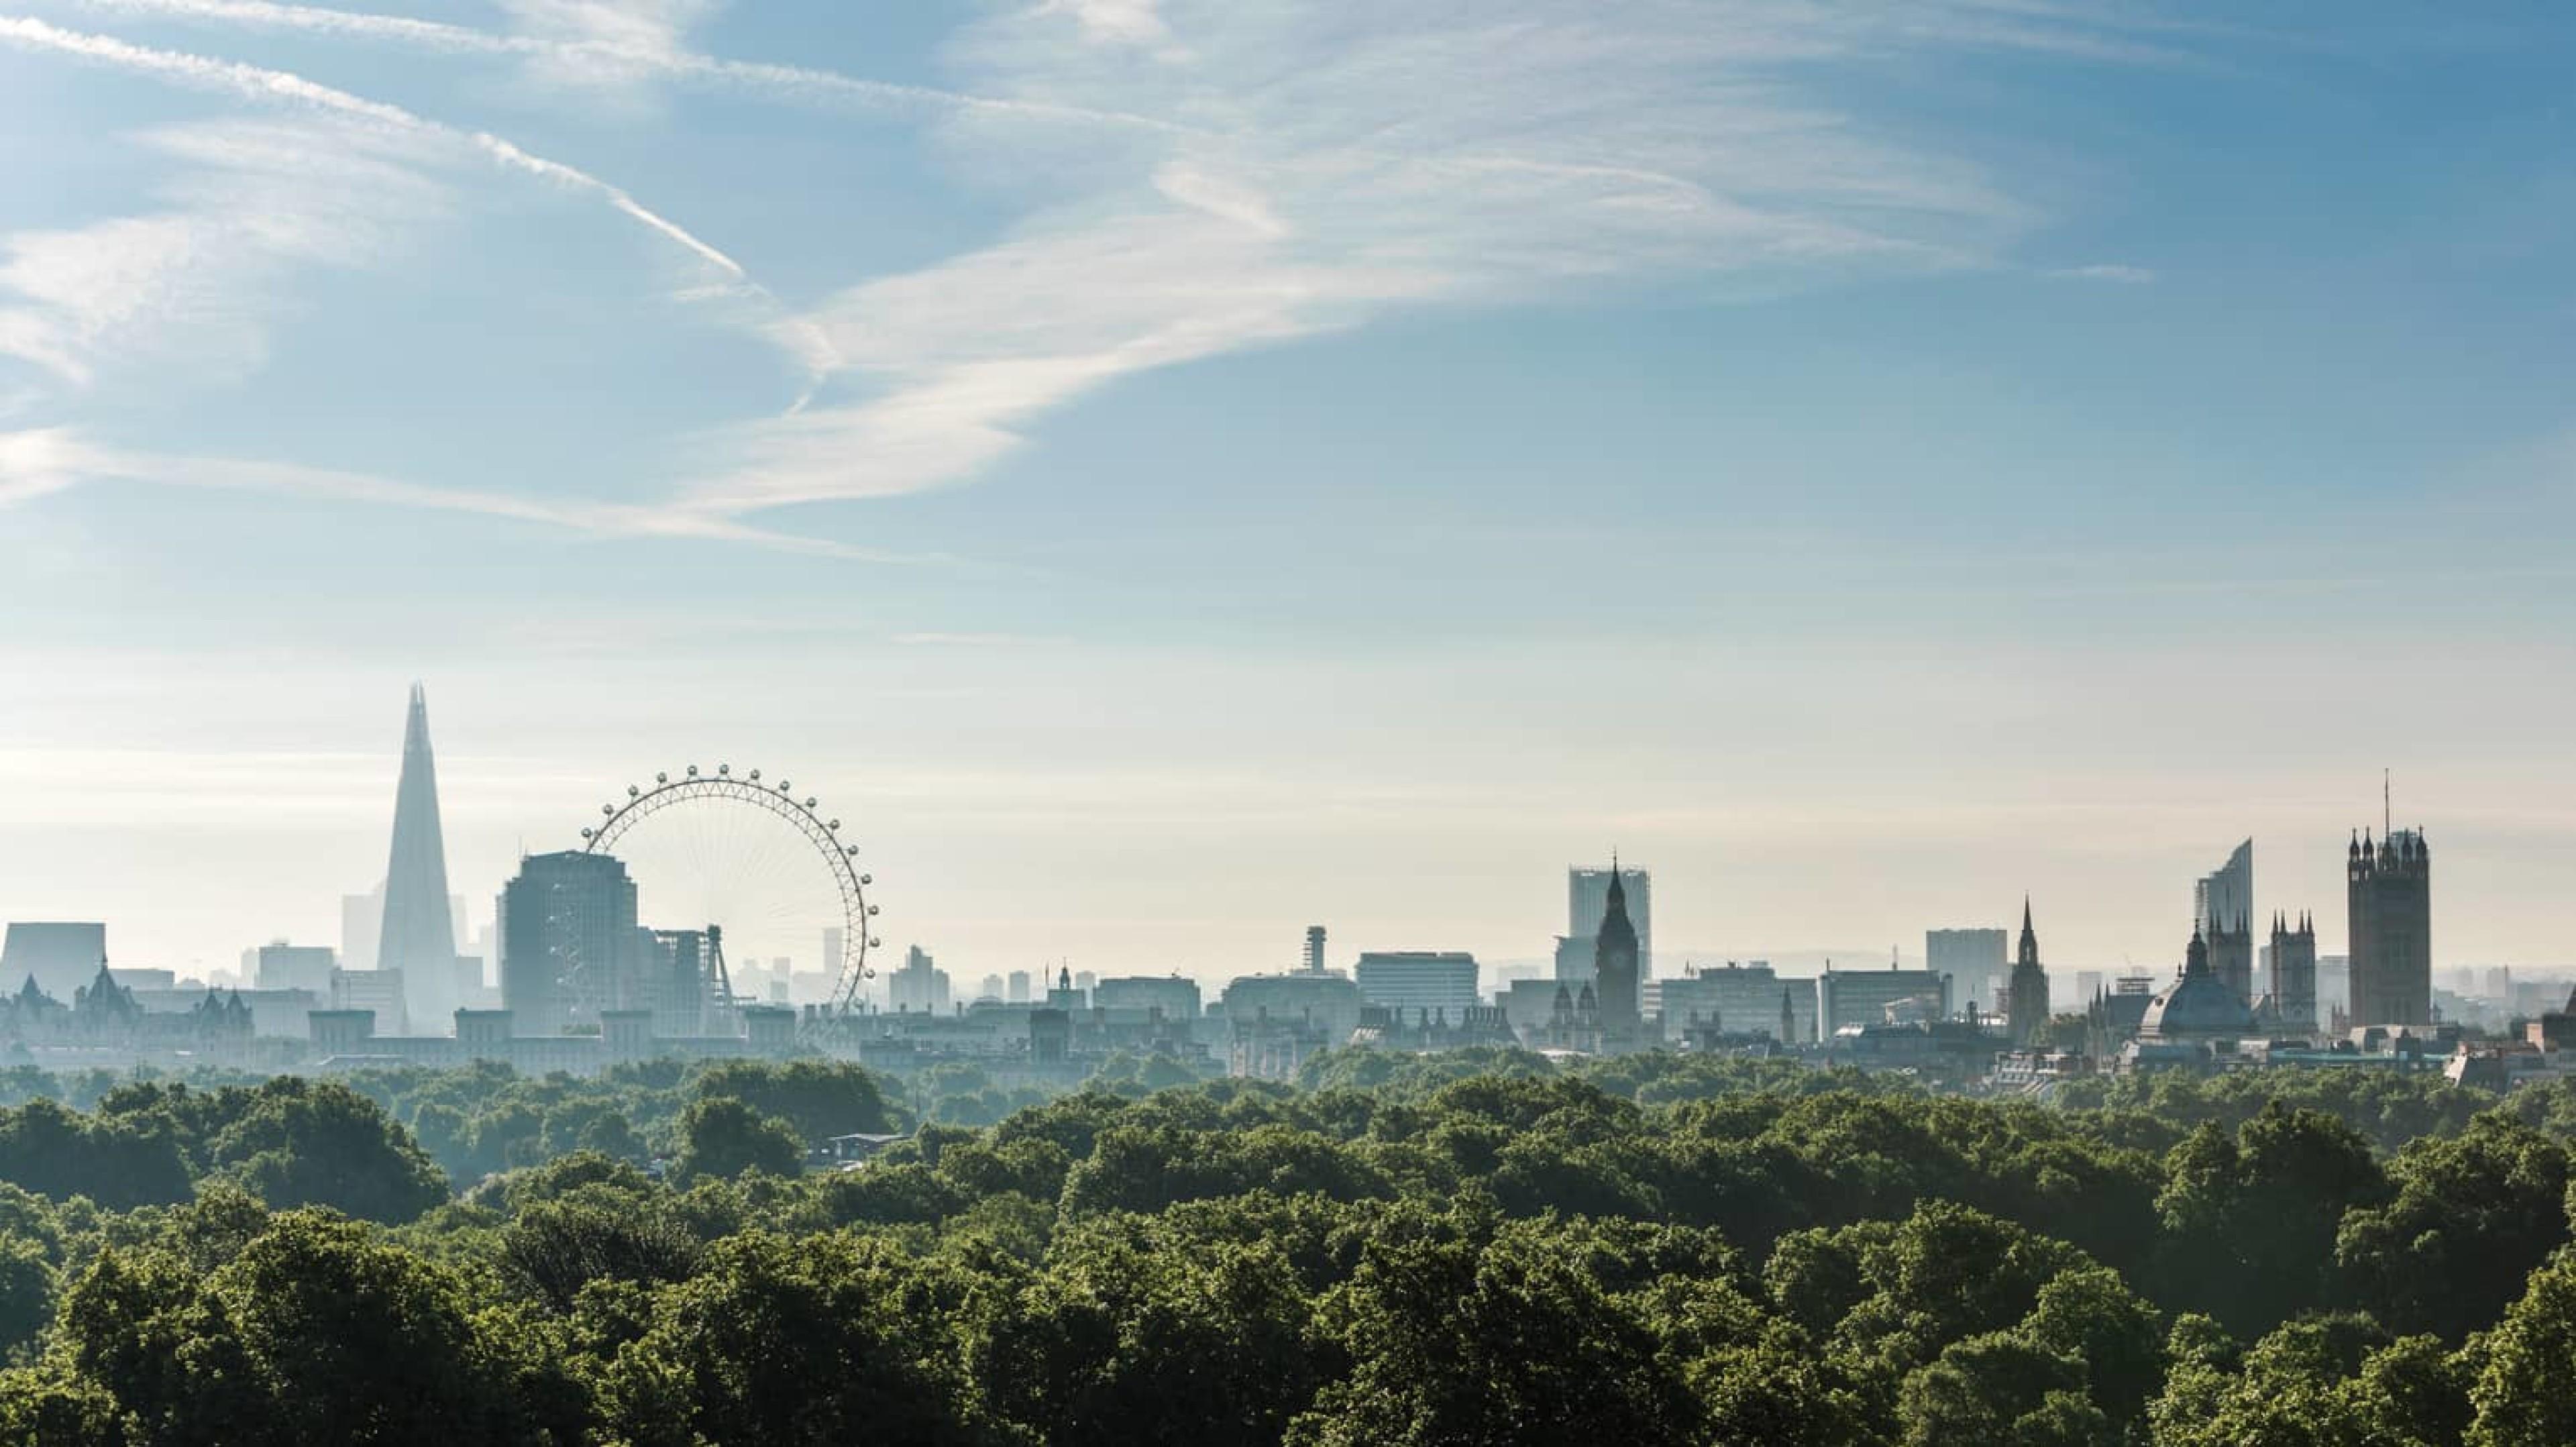 5 Vegan Restaurants in London